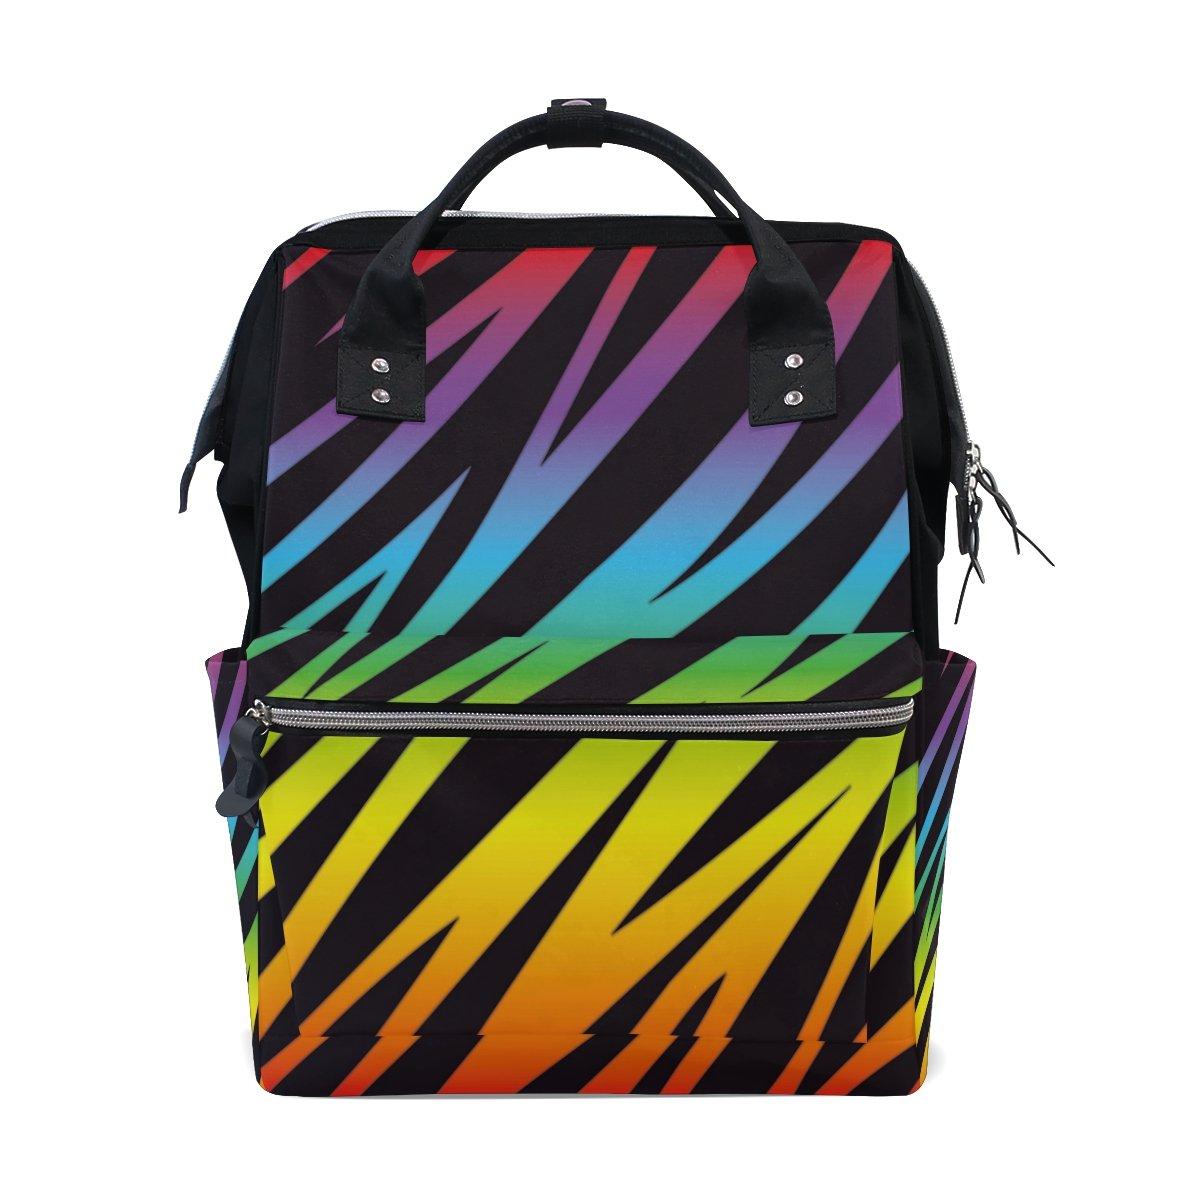 WozoブラックRainbow Zebra印刷多機能おむつバッグバックパック旅行バッグ   B07D6C1F2K